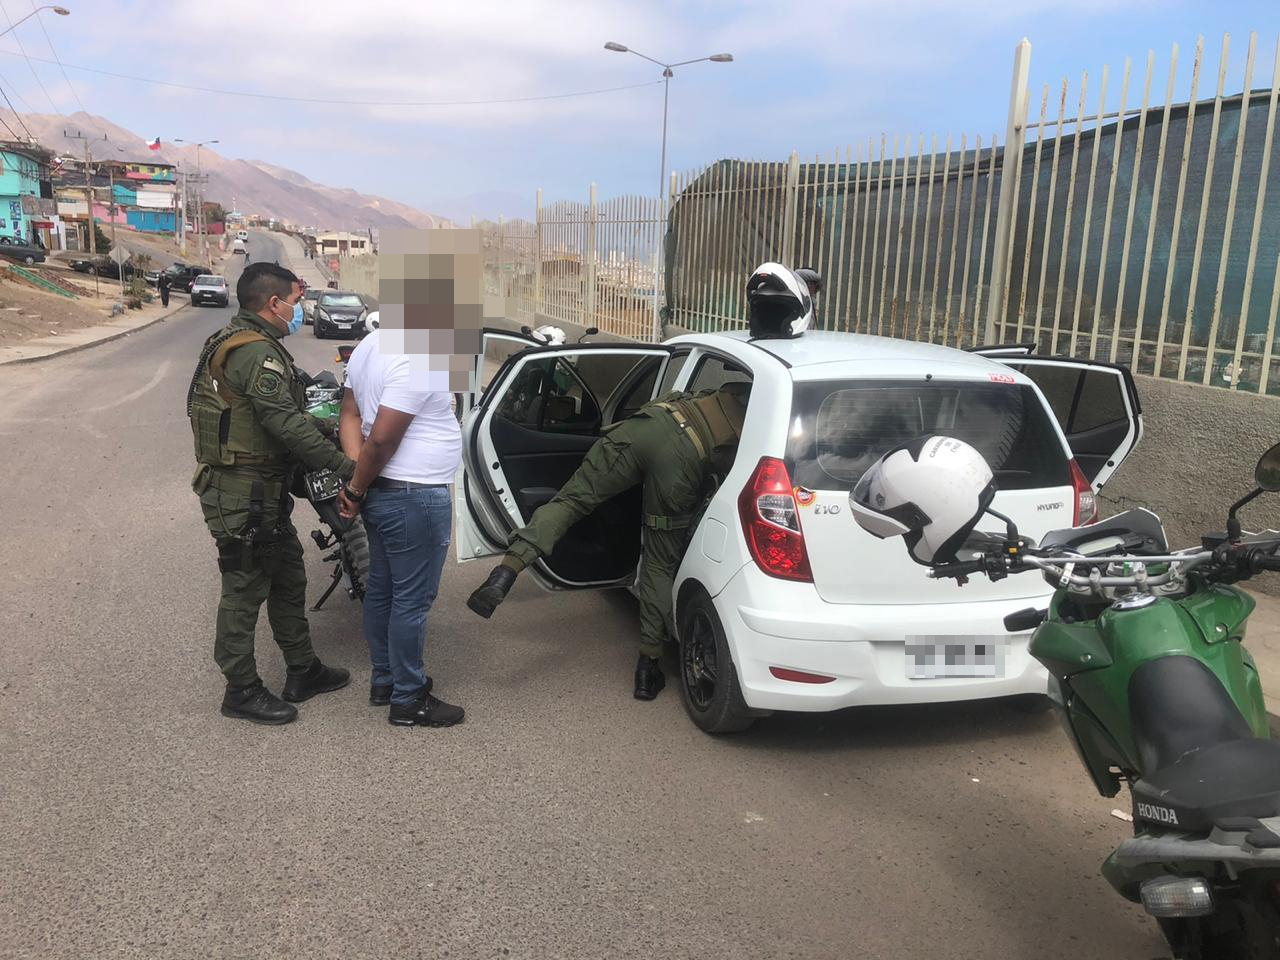 En patrullaje preventivo Carabineros sorprende a sujeto con cocaína base